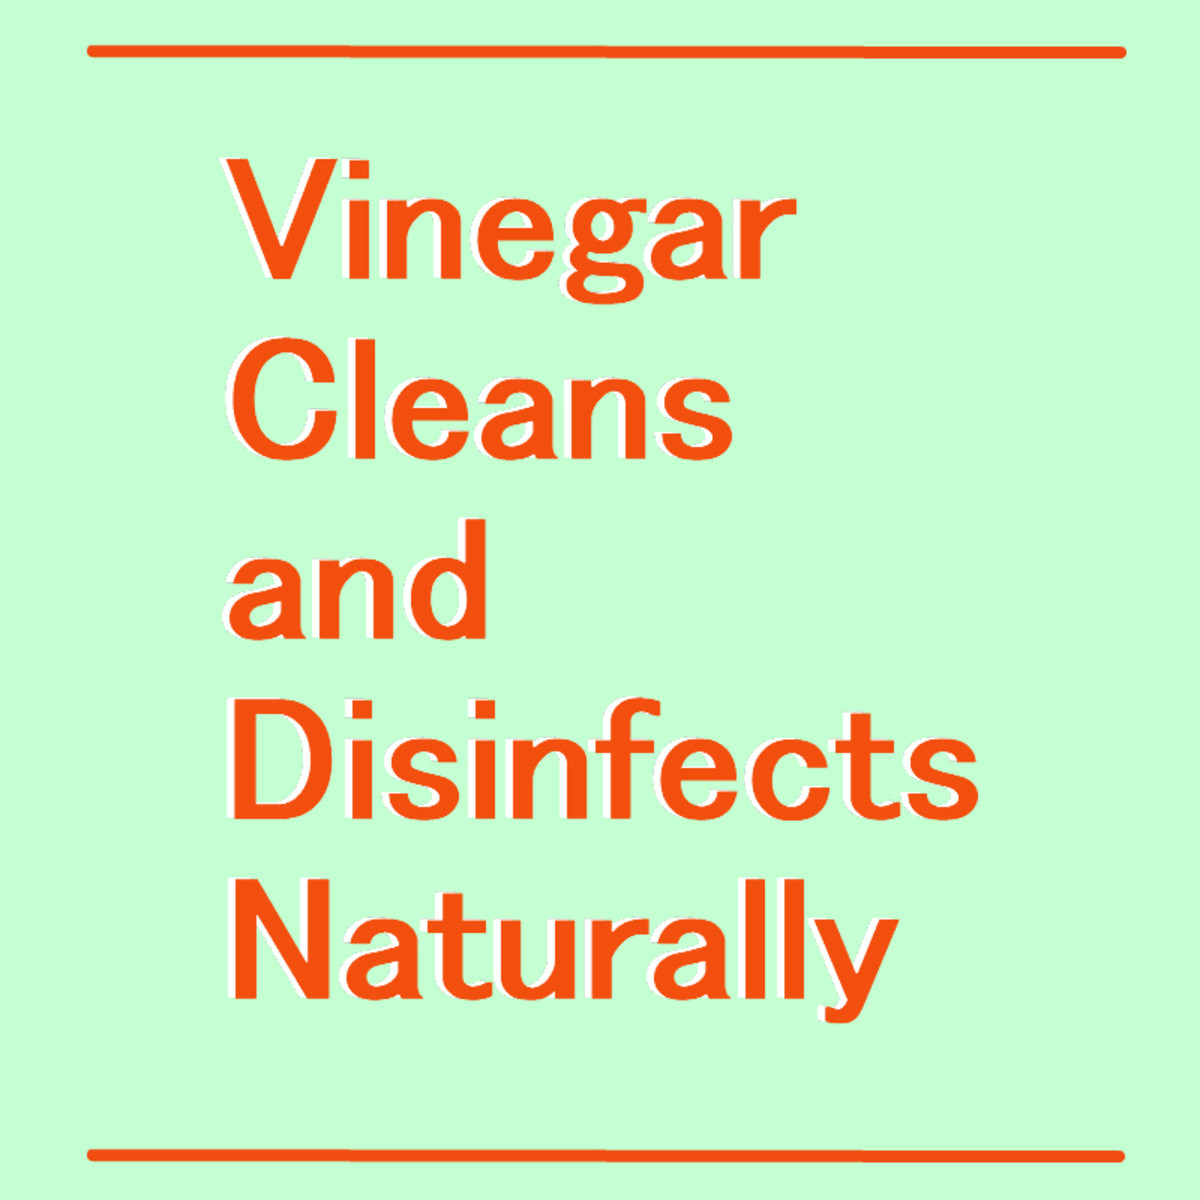 Vinegar: A Safe and Efficient Green Cleaner